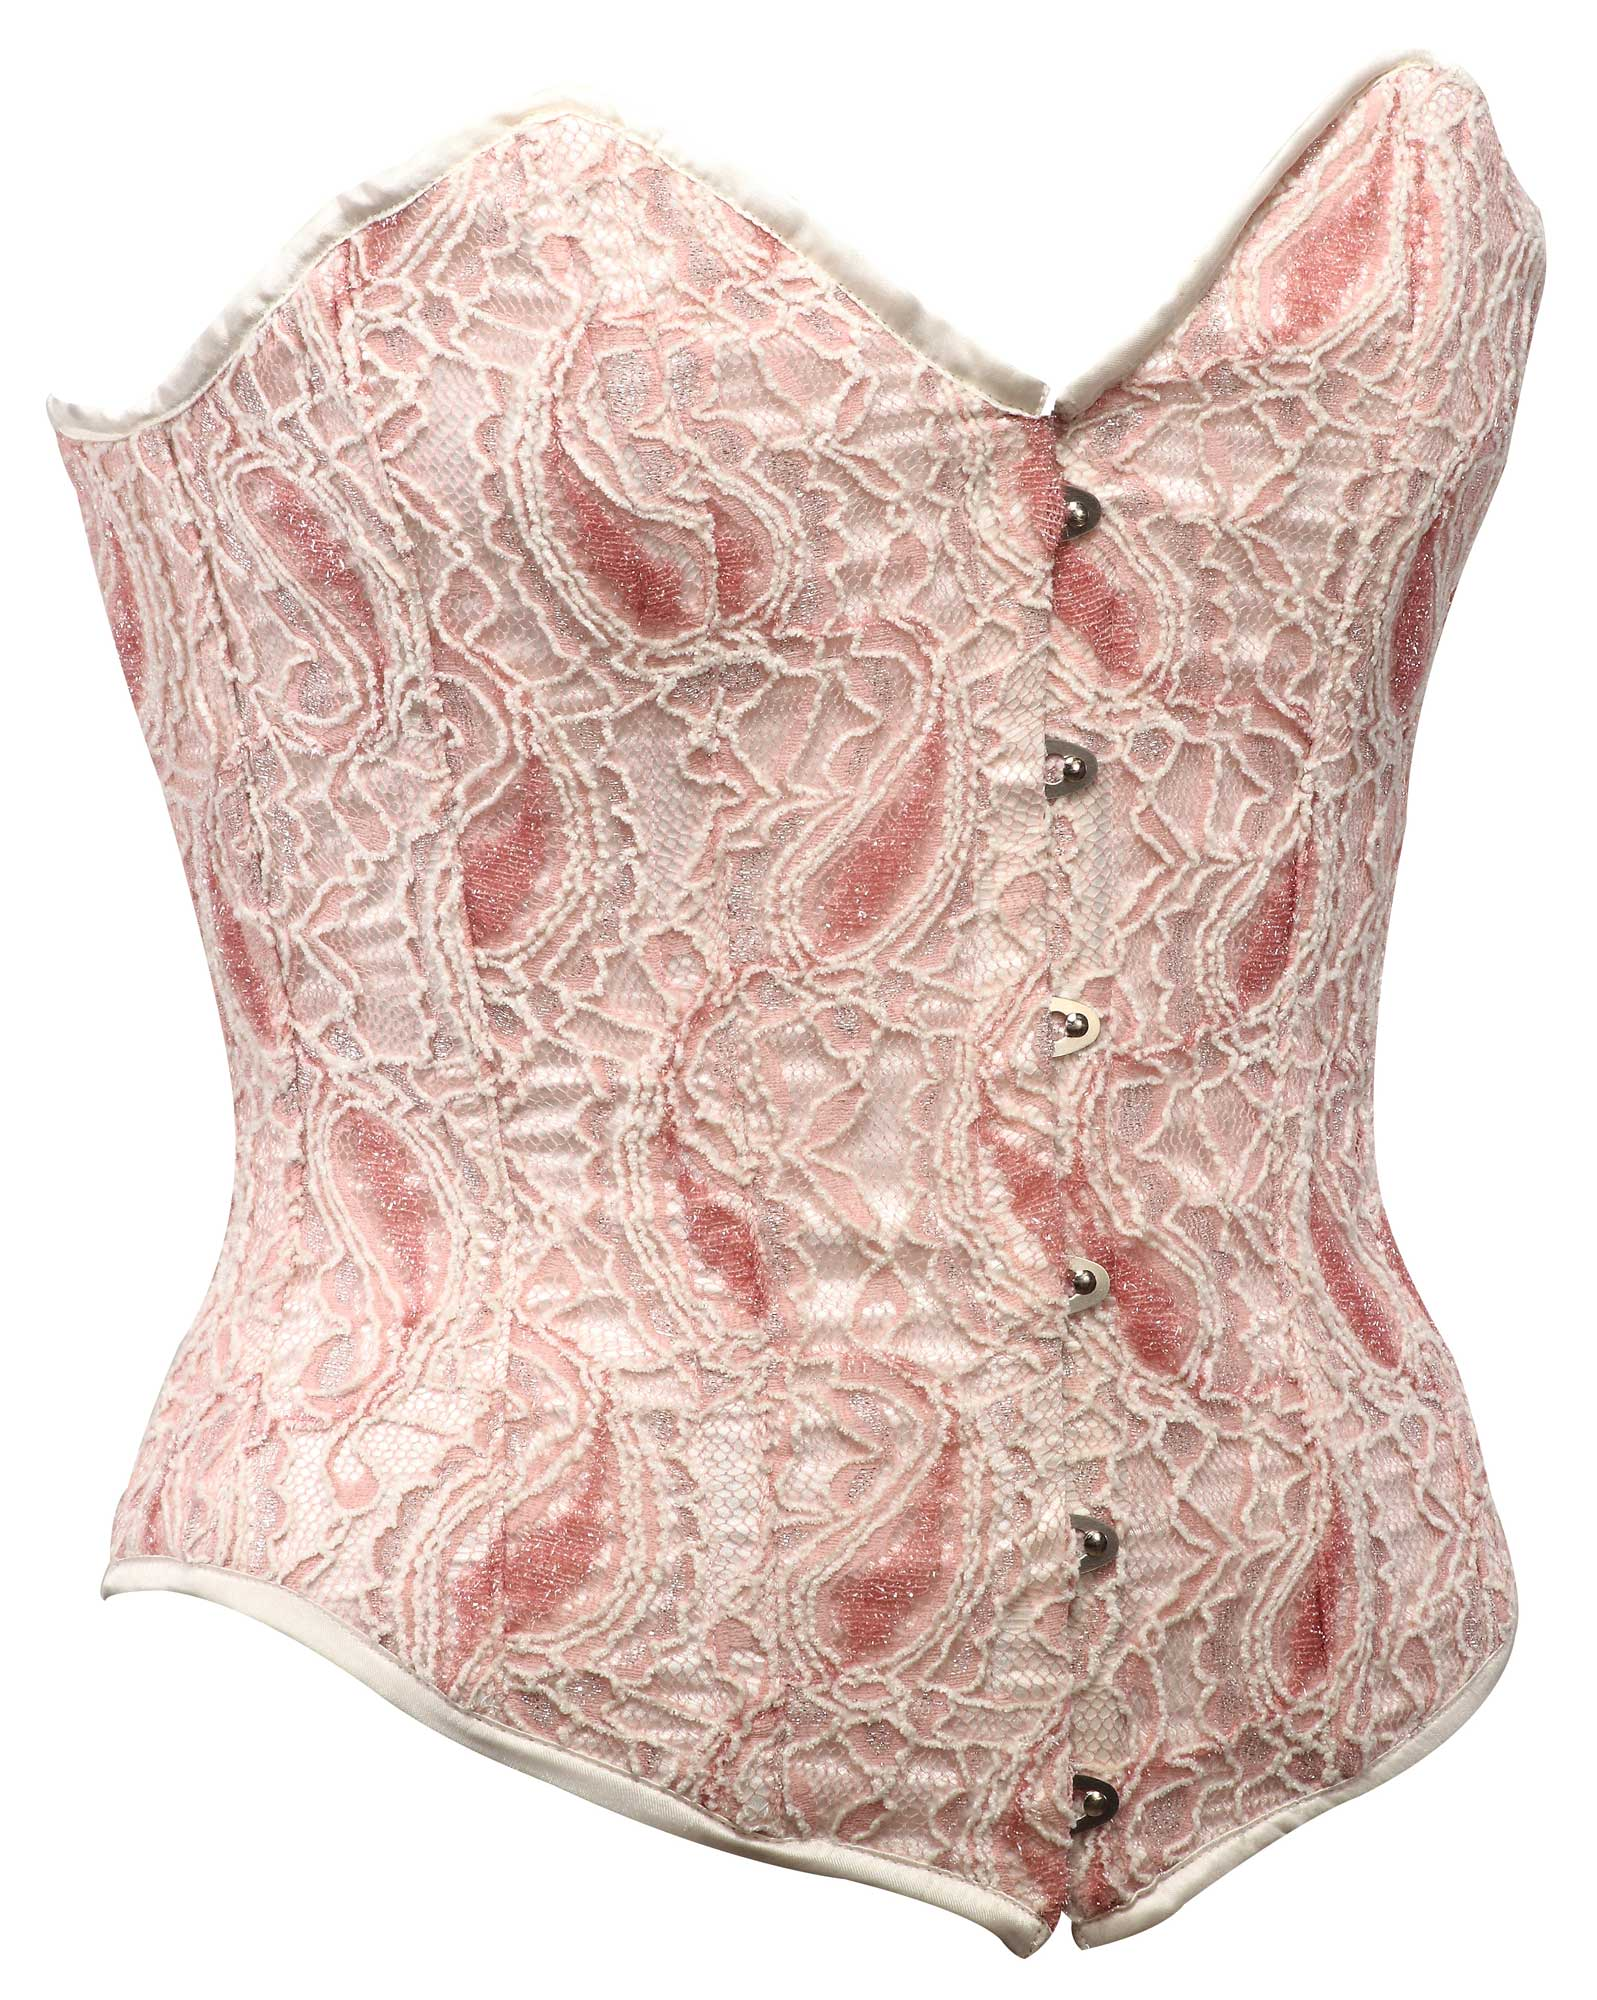 paisley_crochet_steel_boning_corset_waist_cincher_bustier_bustiers_and_corsets_4.jpg